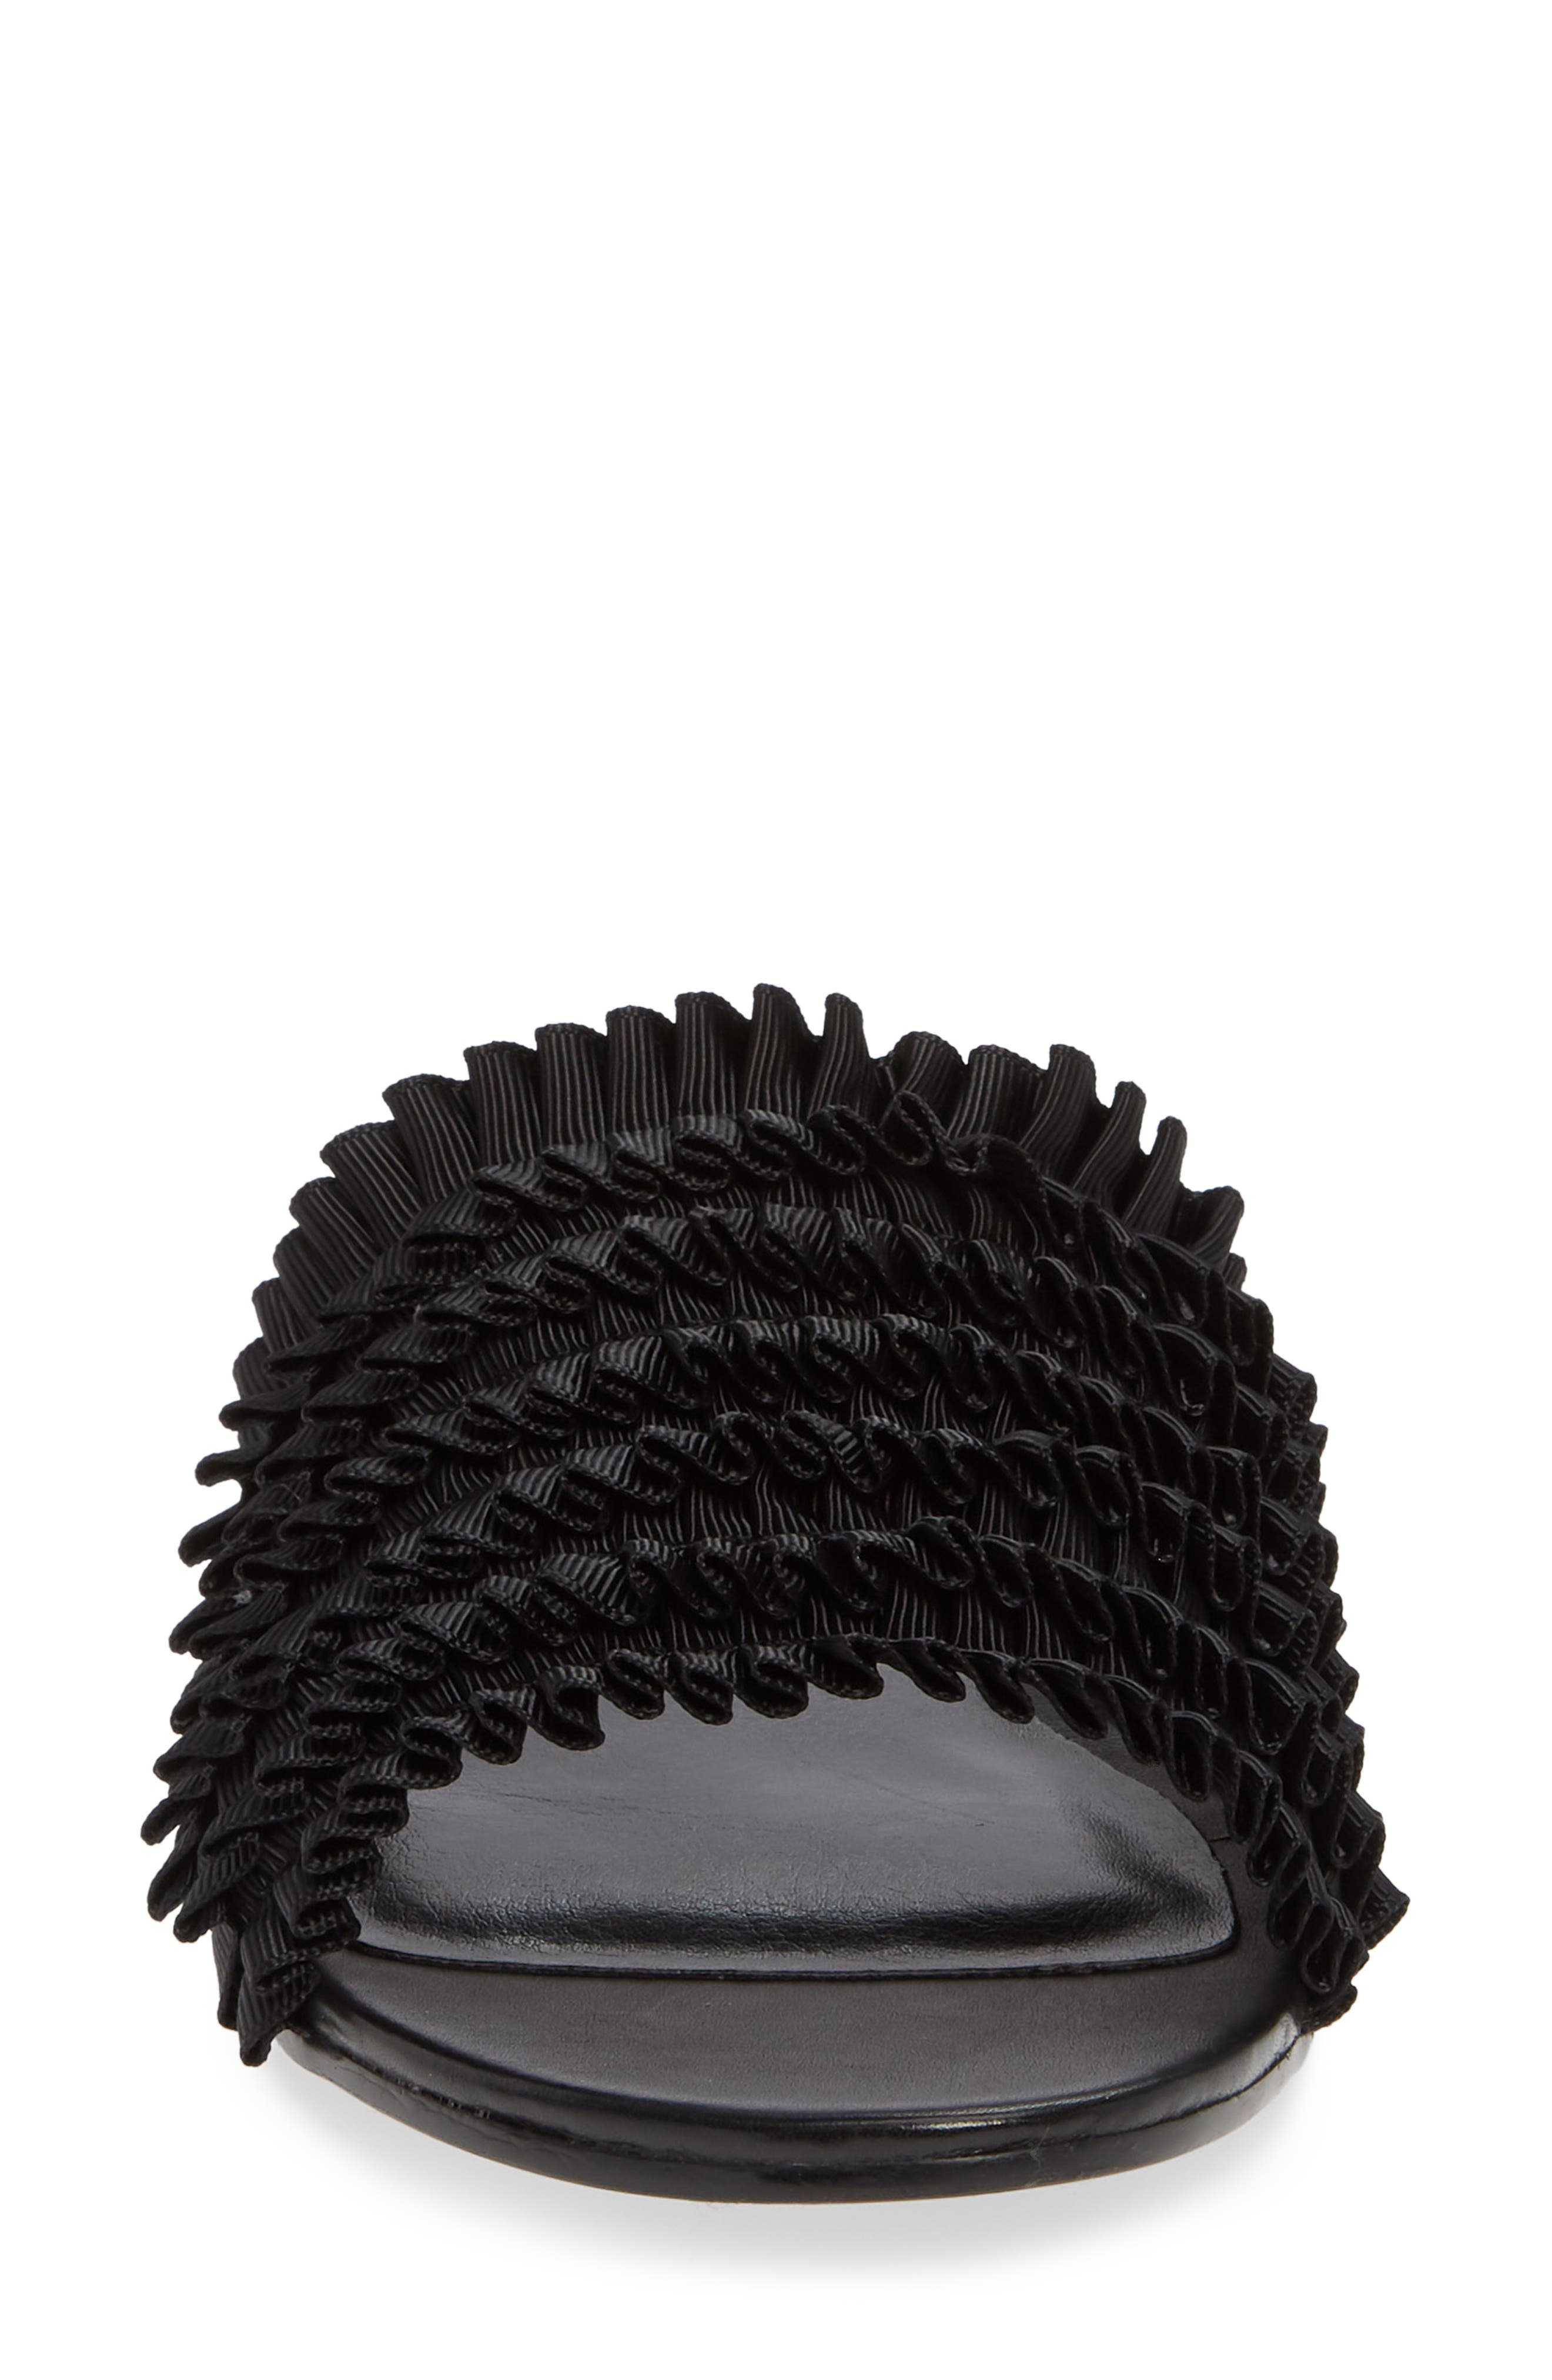 Jerzy Slide Sandal,                             Alternate thumbnail 4, color,                             BLACK FABRIC